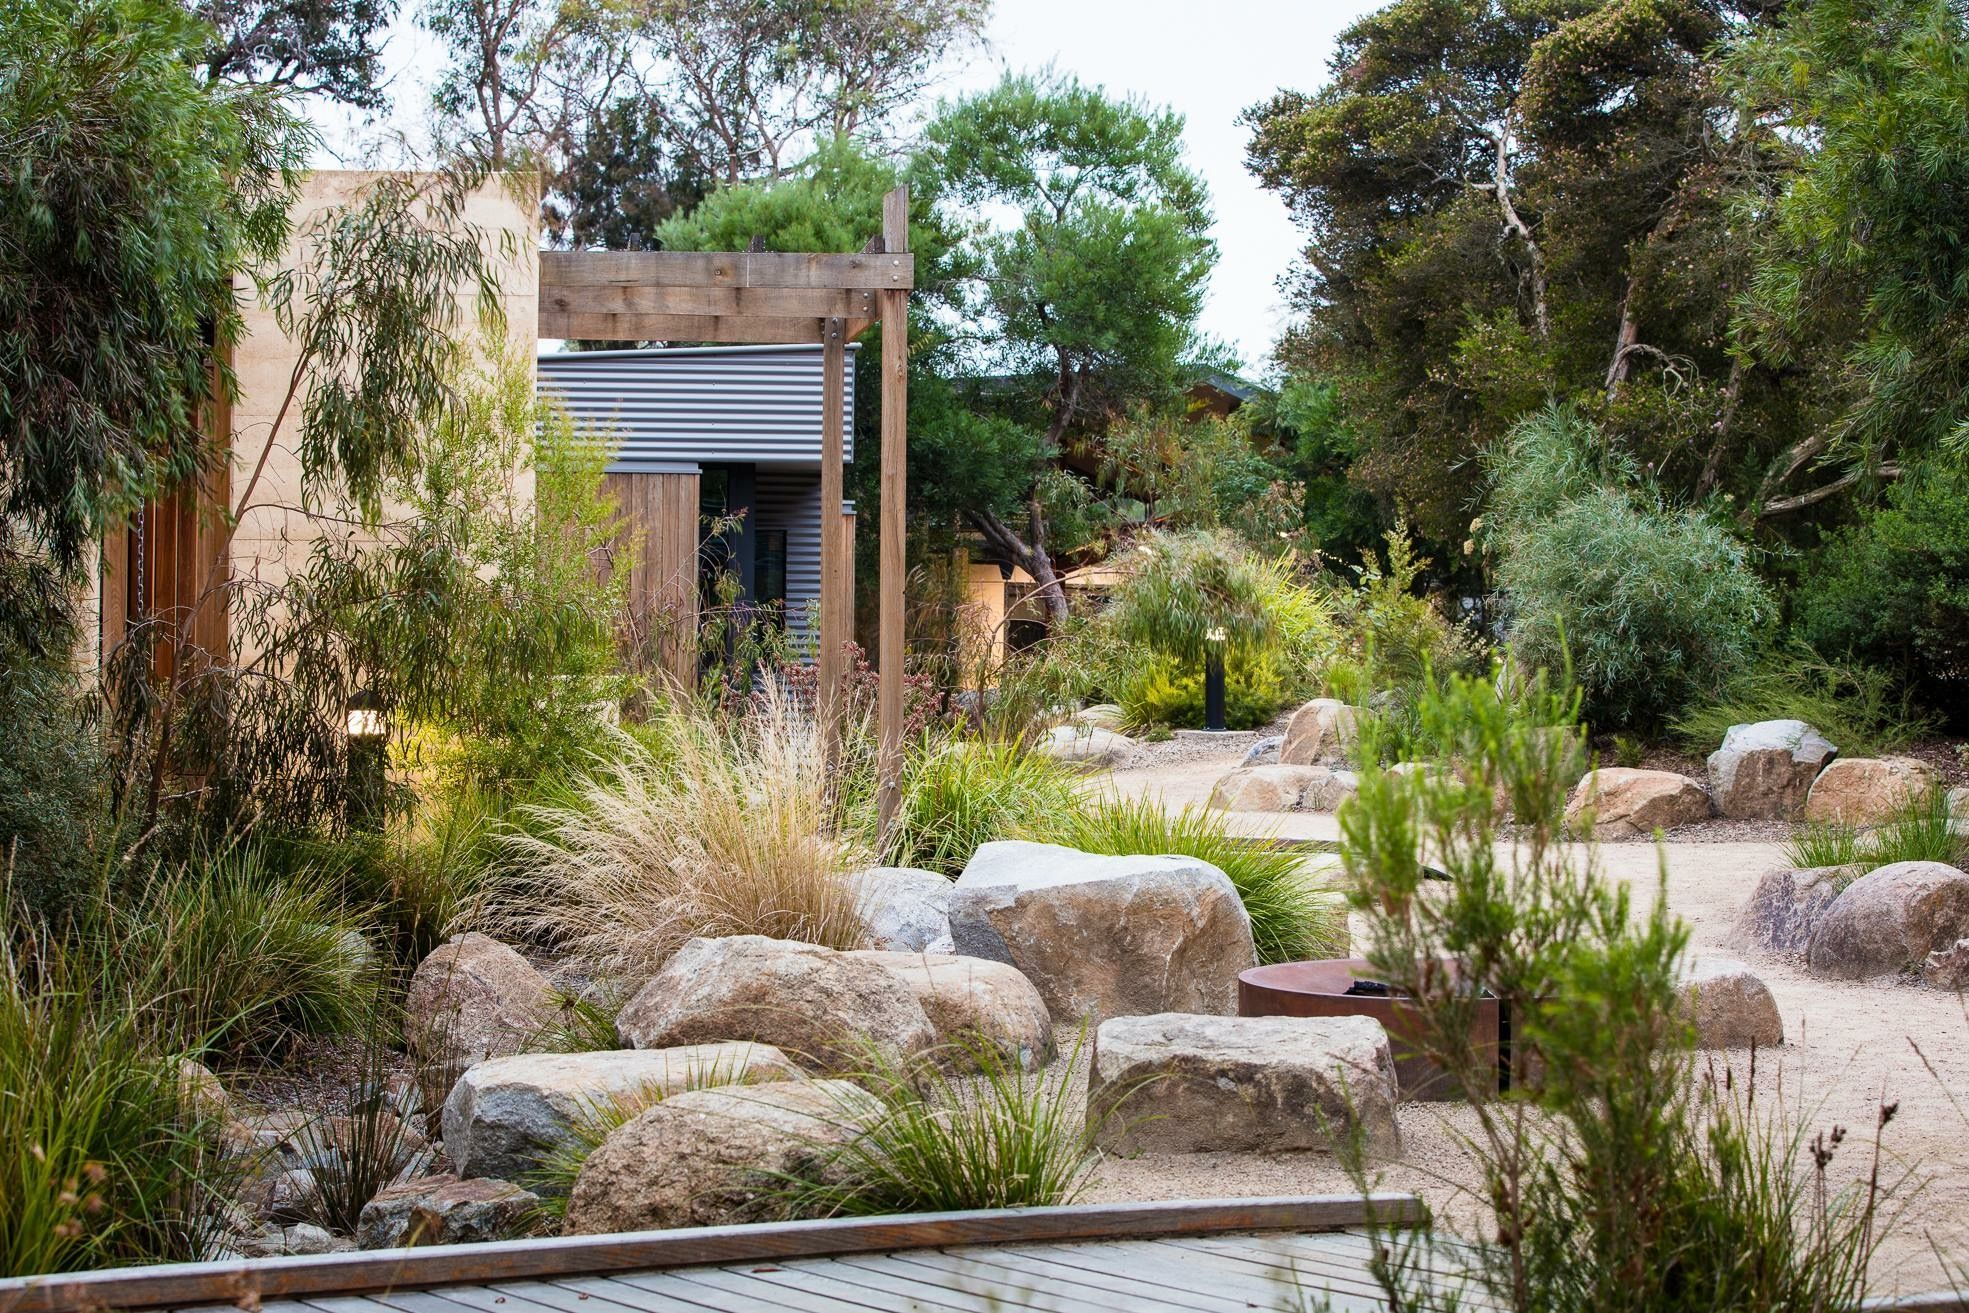 desertscape garden | Australian garden design, Australian ...